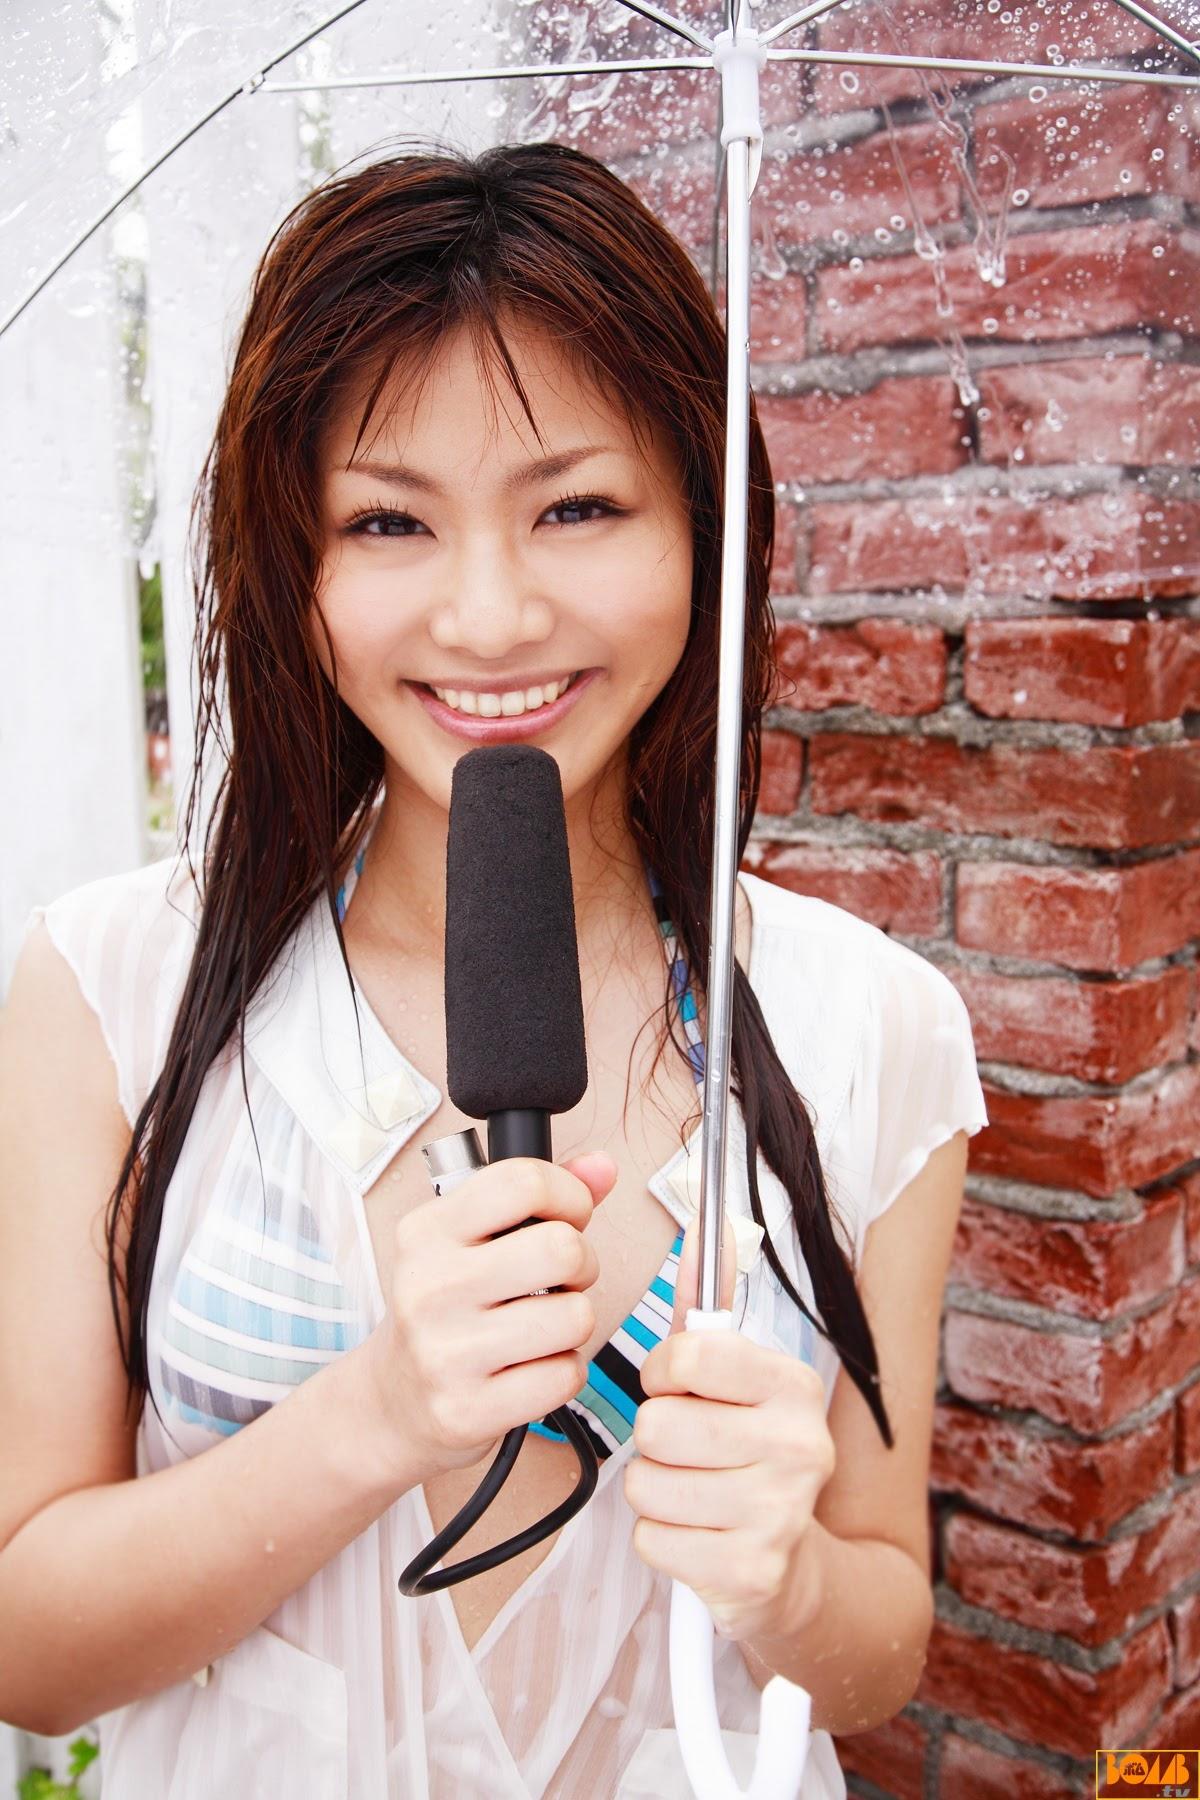 New era gravure harbor contact wet transparent sheer weather sister Rika Sato019